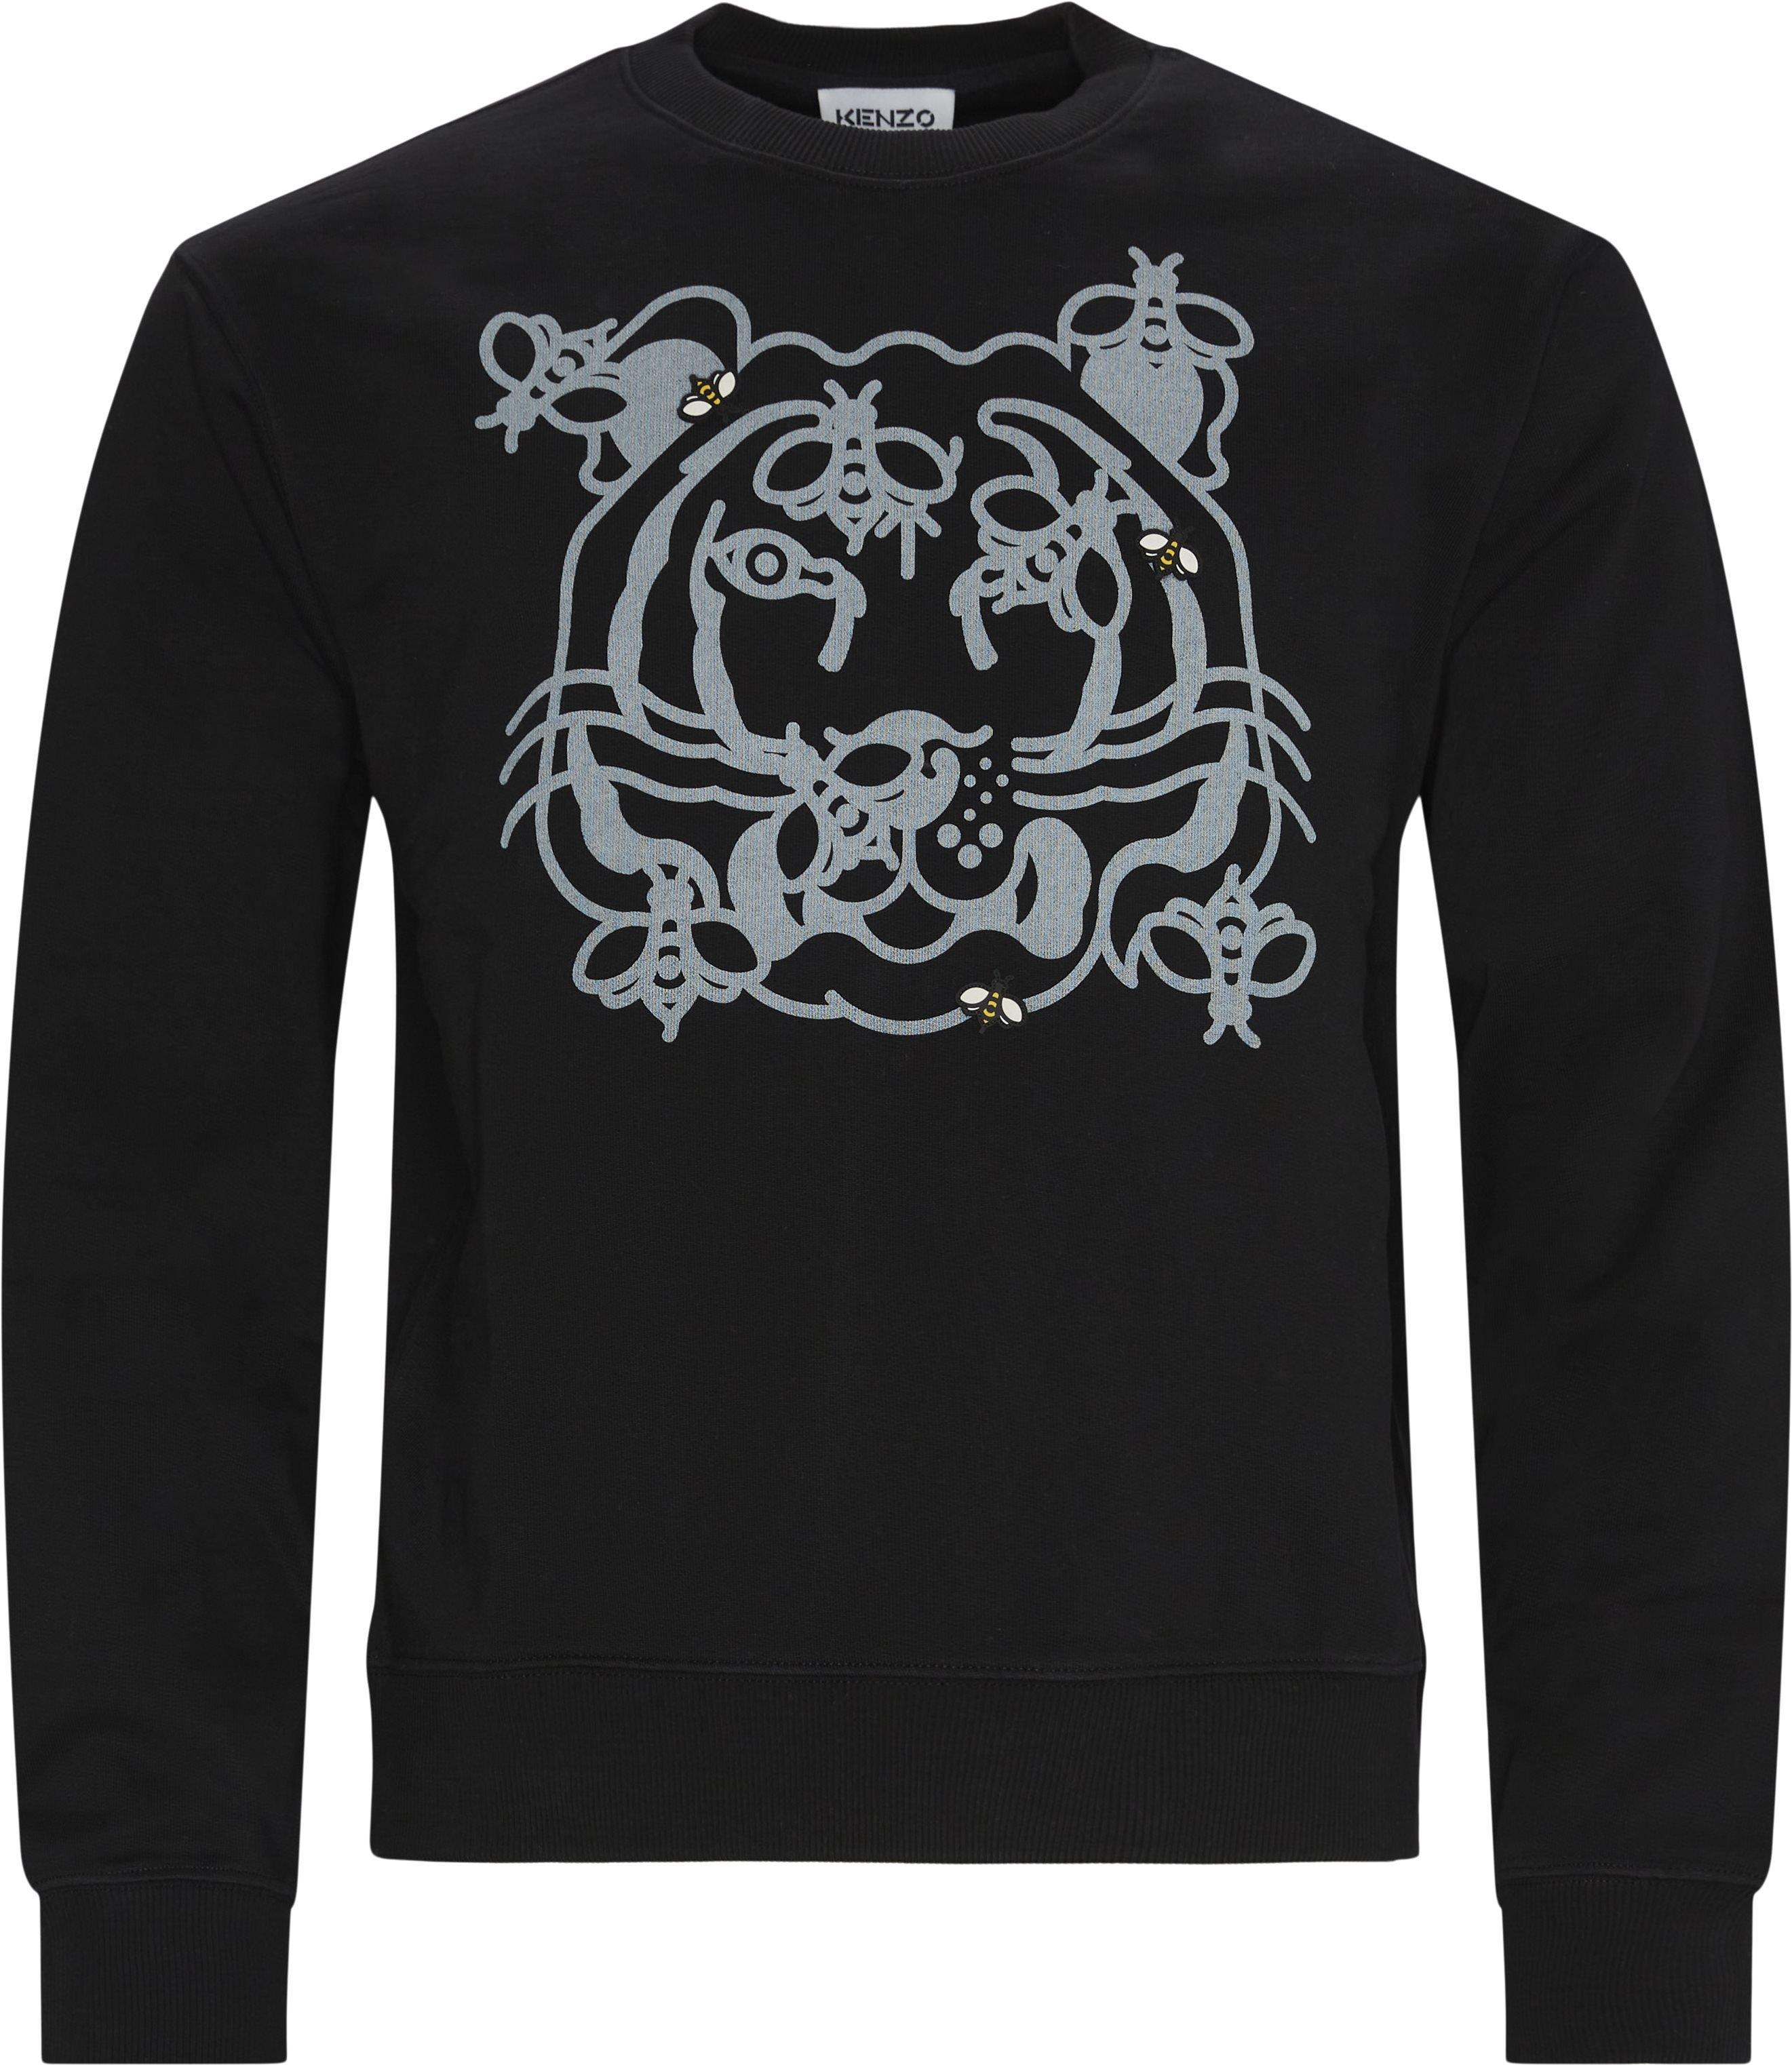 Sweatshirts - Regular fit - Black